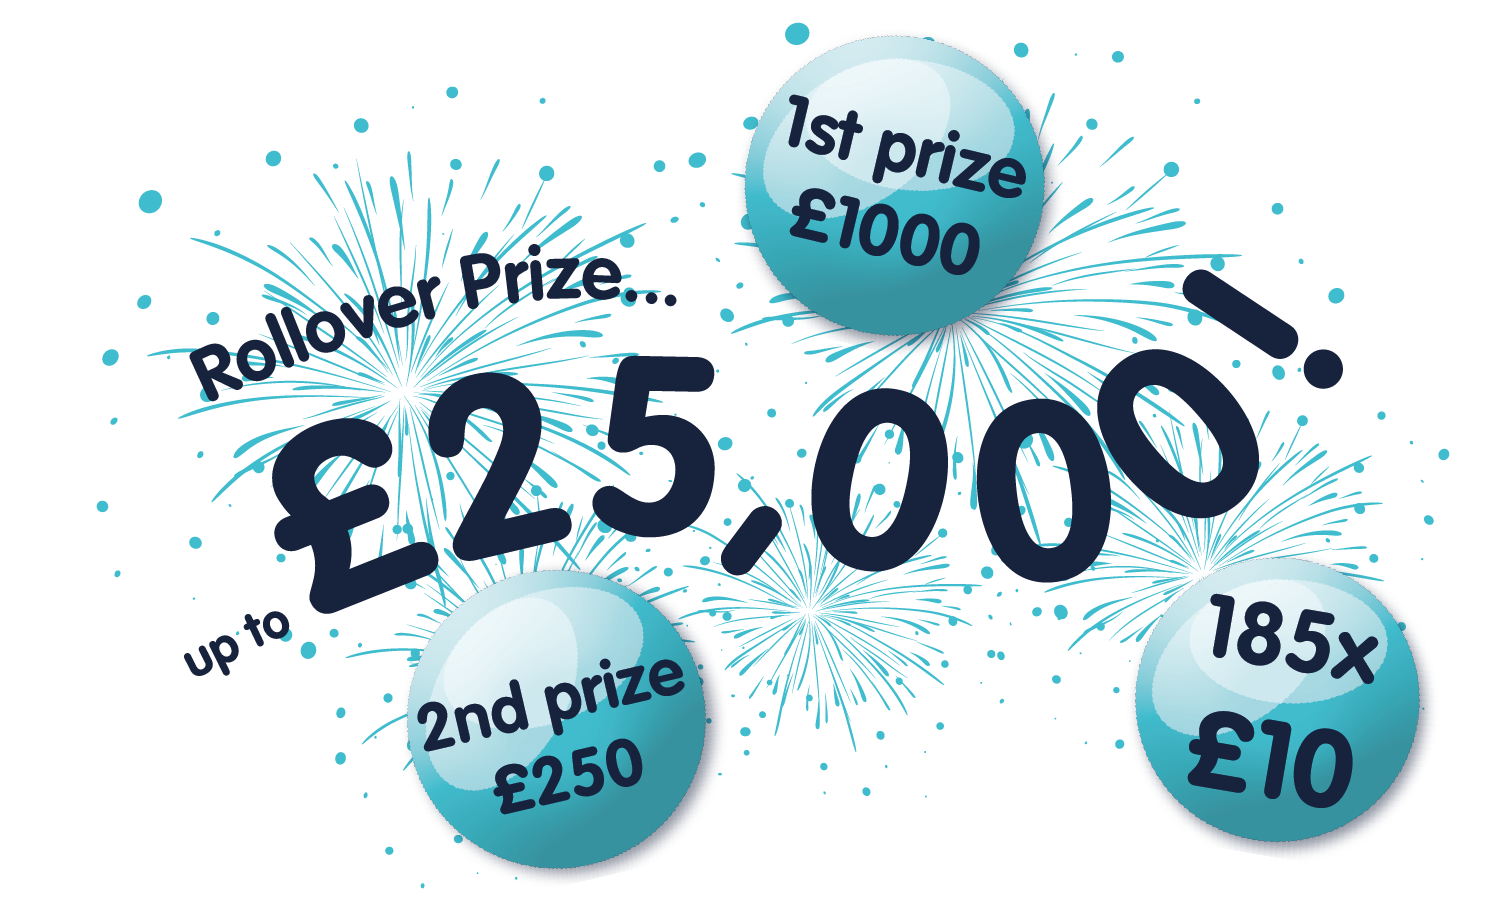 New Prize Fund